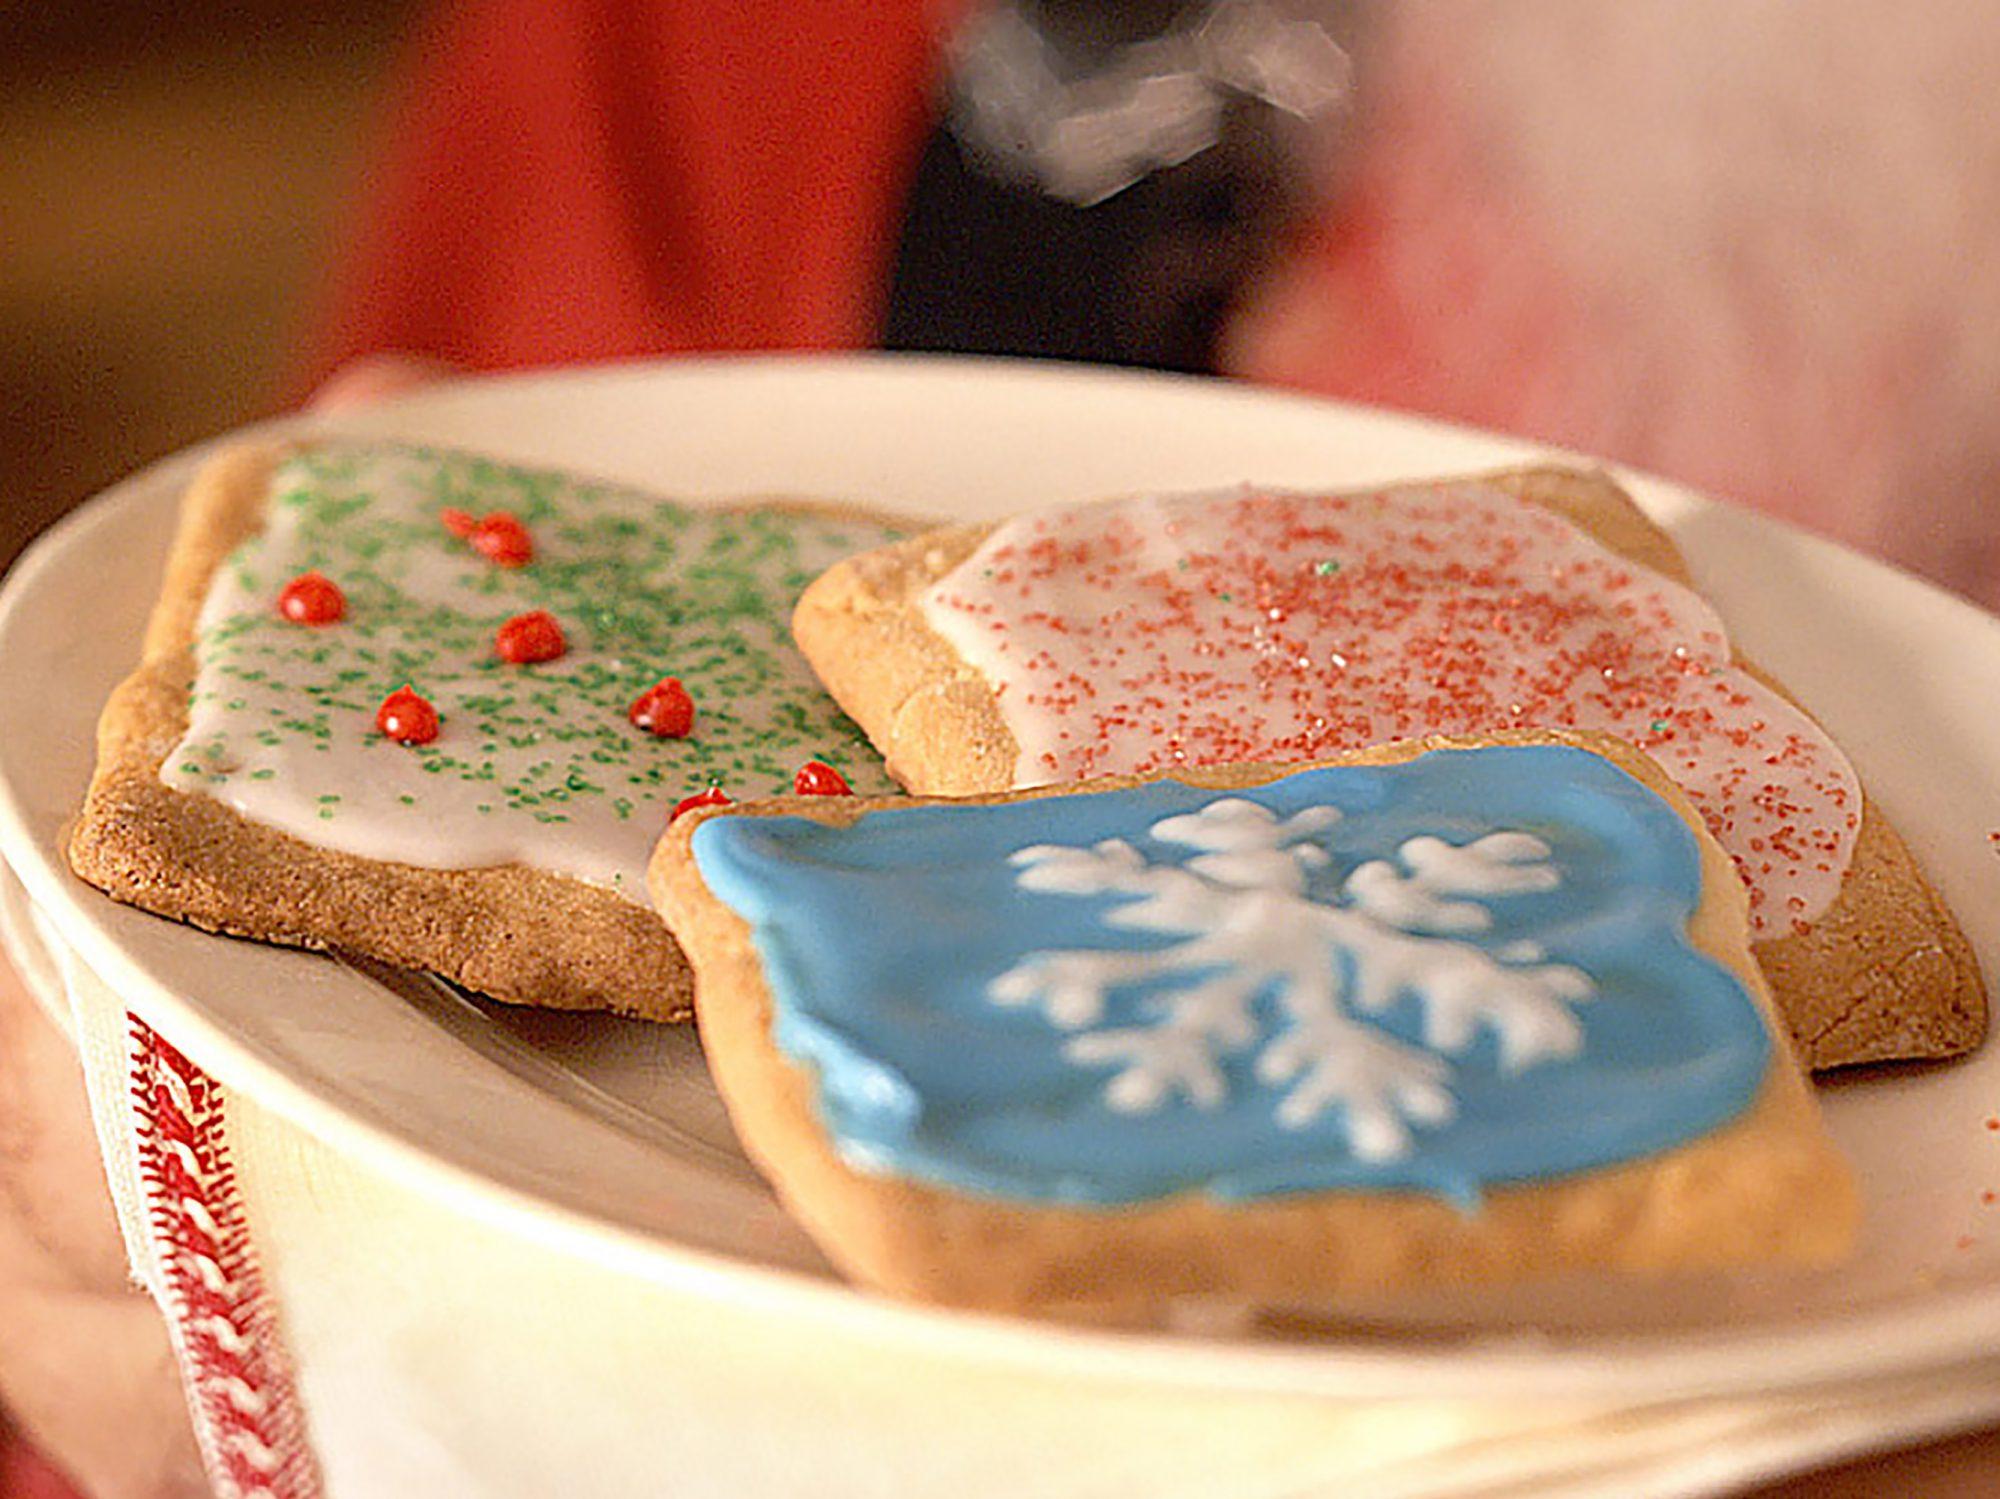 Lemon-Frosted Sugar Cookies